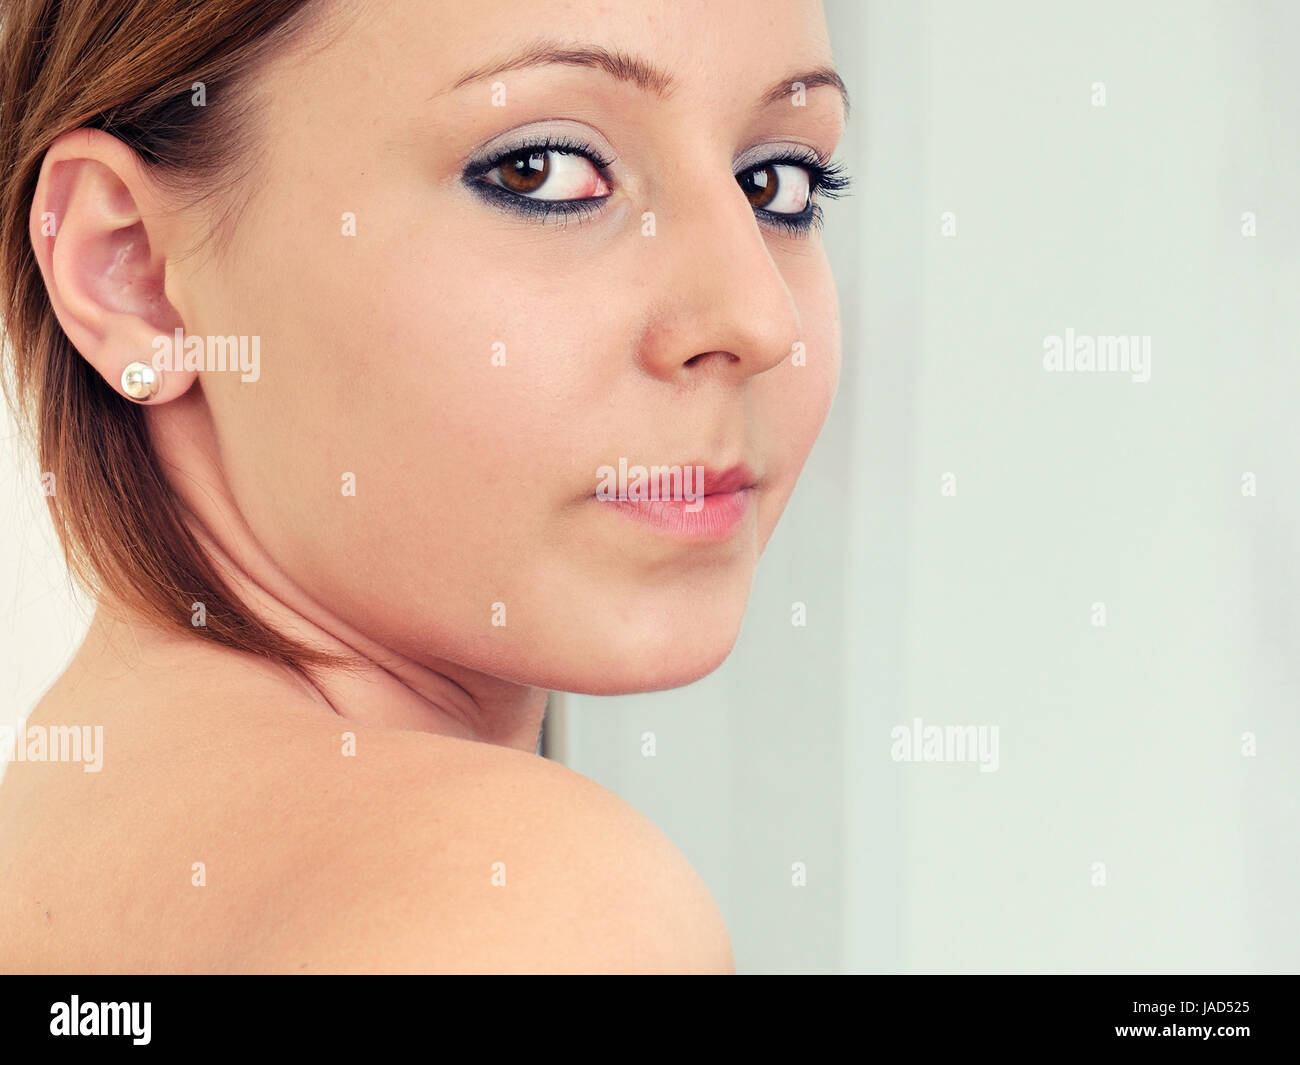 Frau Frisur Junge Frau Maquillage Maquillage Schminke Look